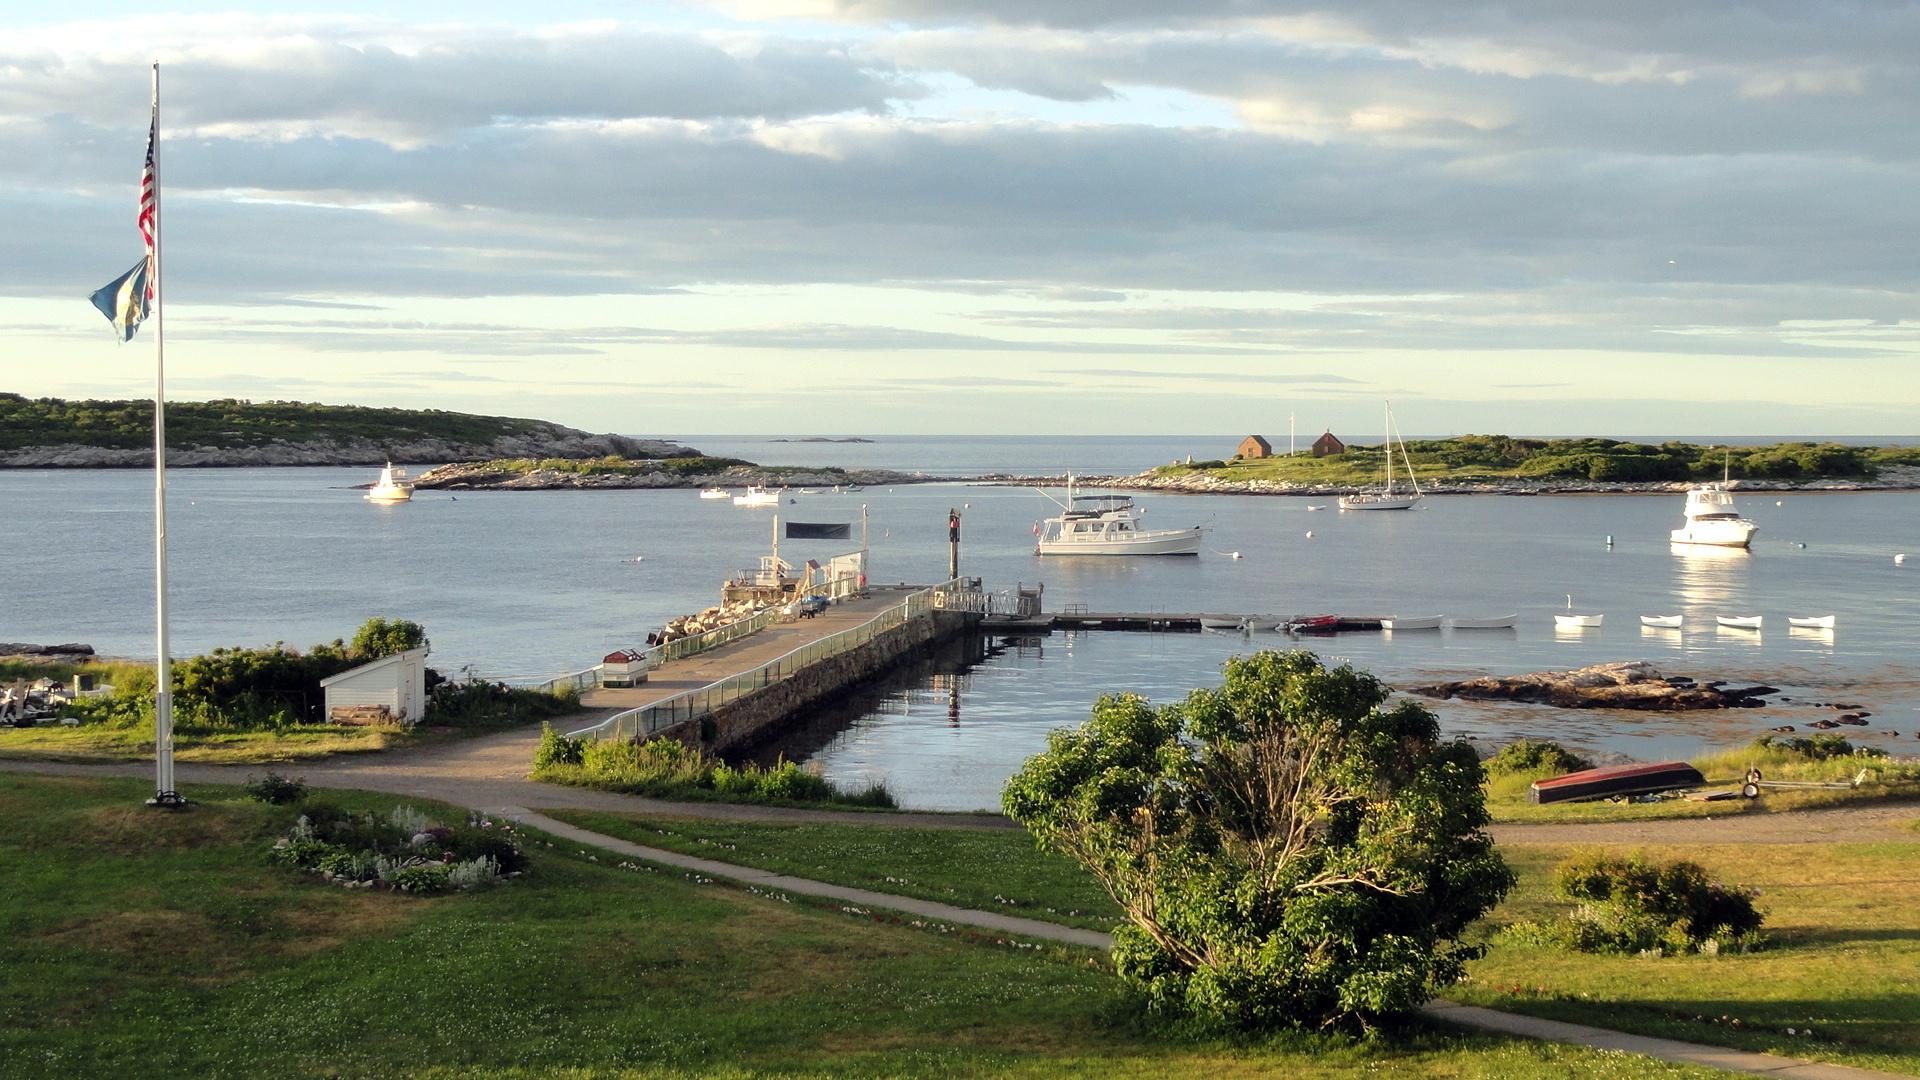 Flagpole - Dock - Harbor - Islands